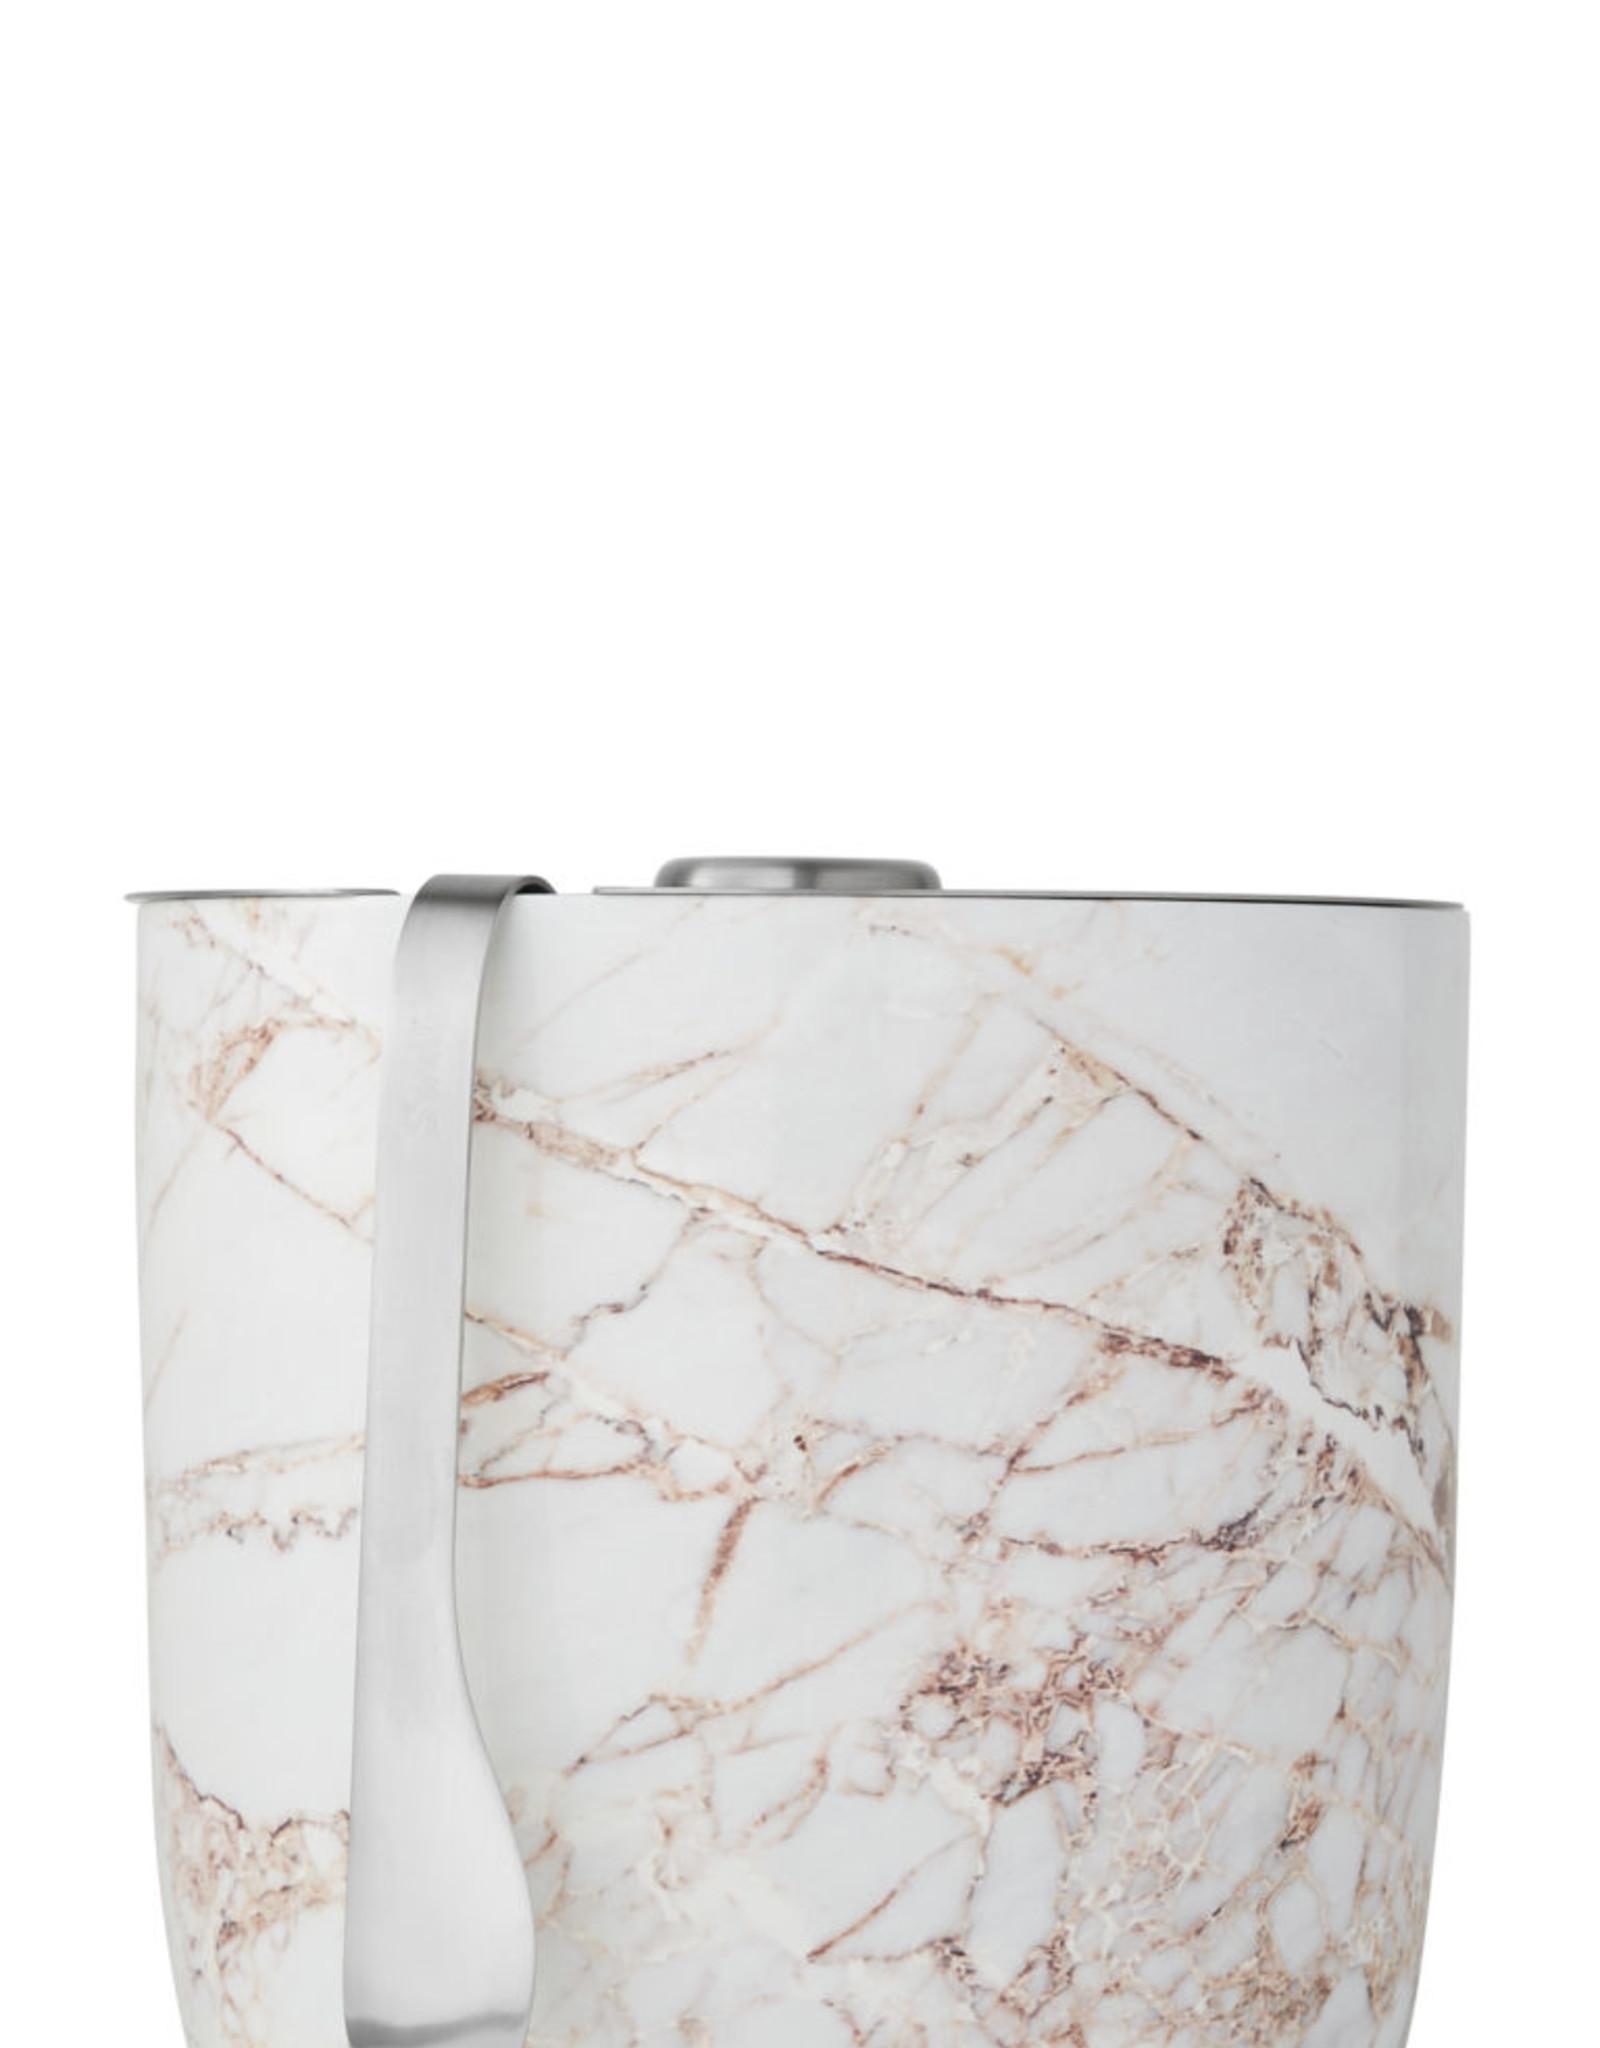 Swell Bottle 68oz Calacatta Gold Ice Bucket